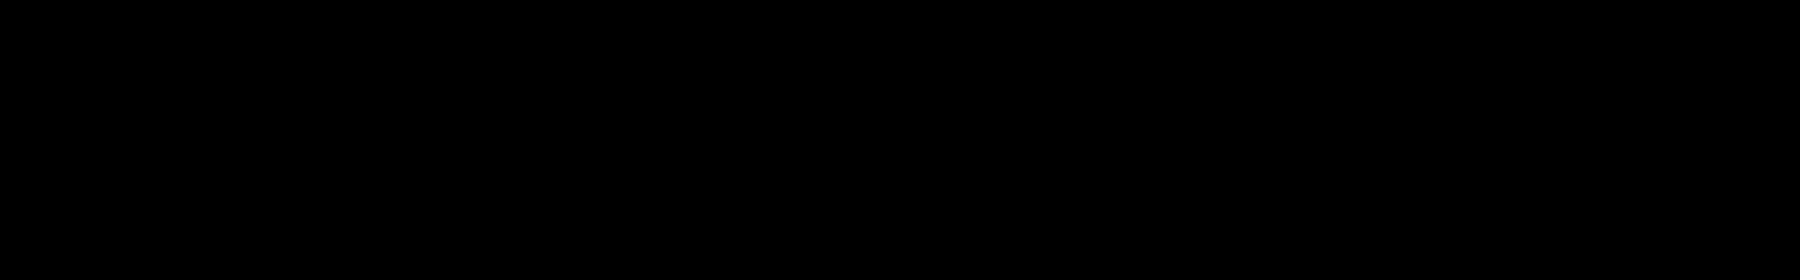 EDM Shock audio waveform